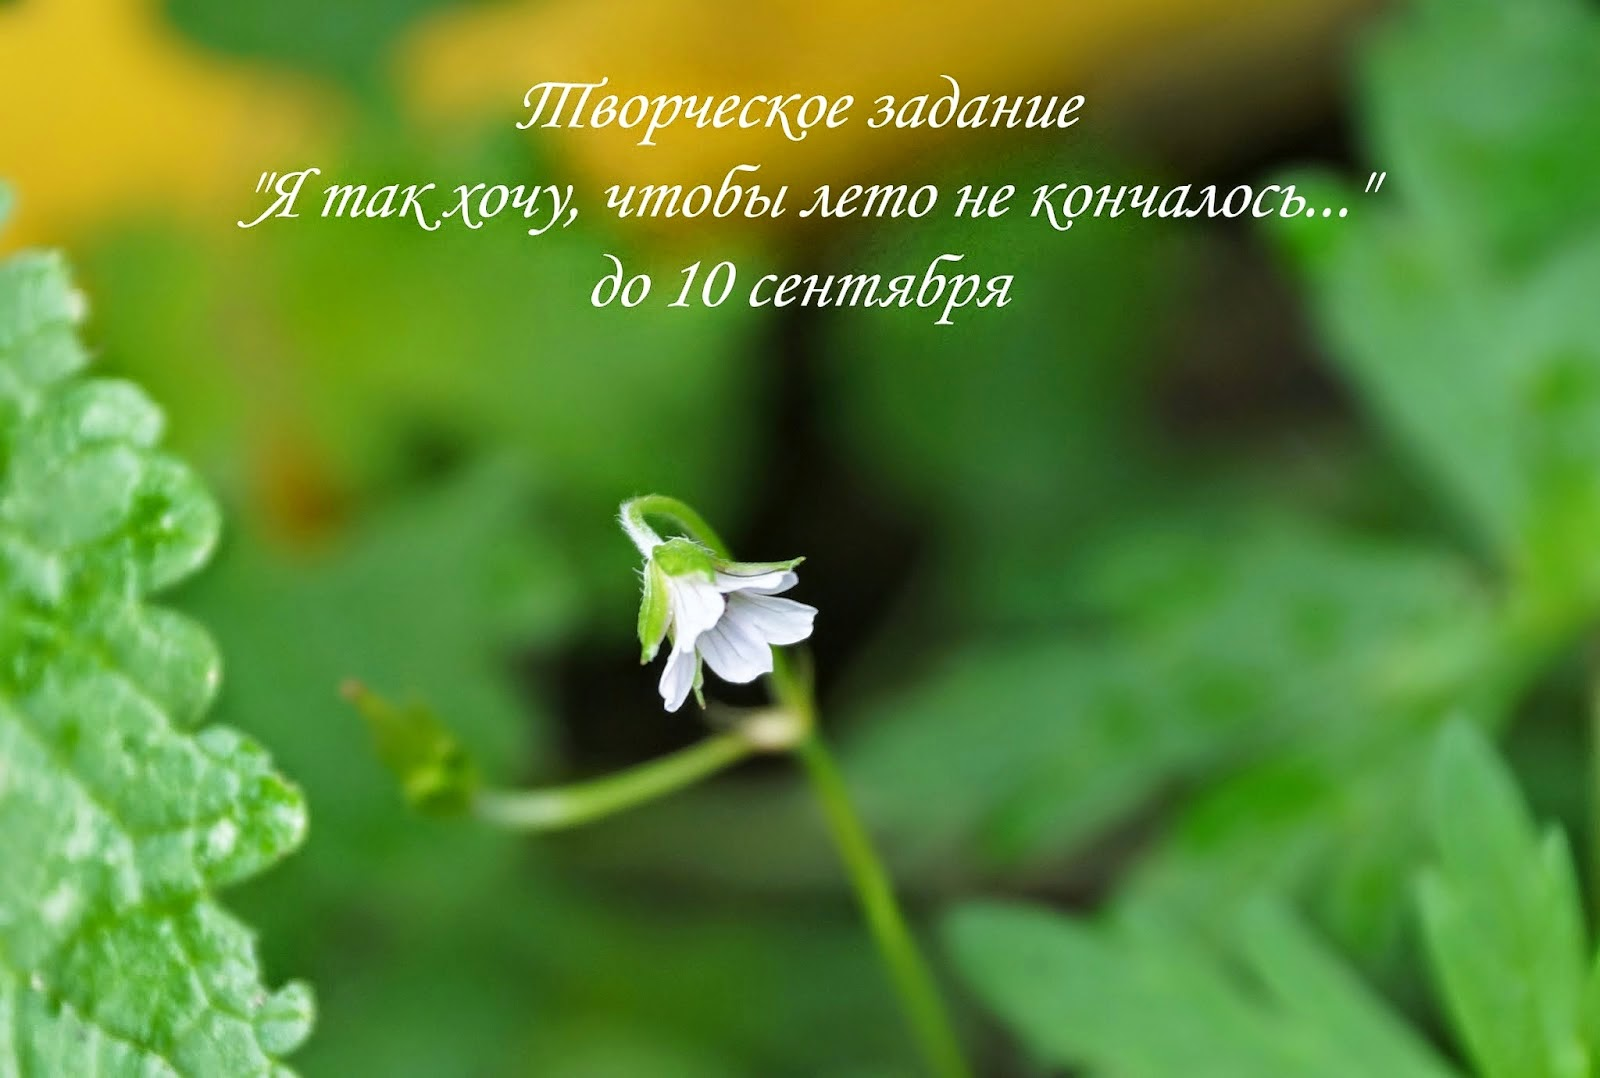 http://cherdaksovi.blogspot.ru/2014/07/blog-post_25.html